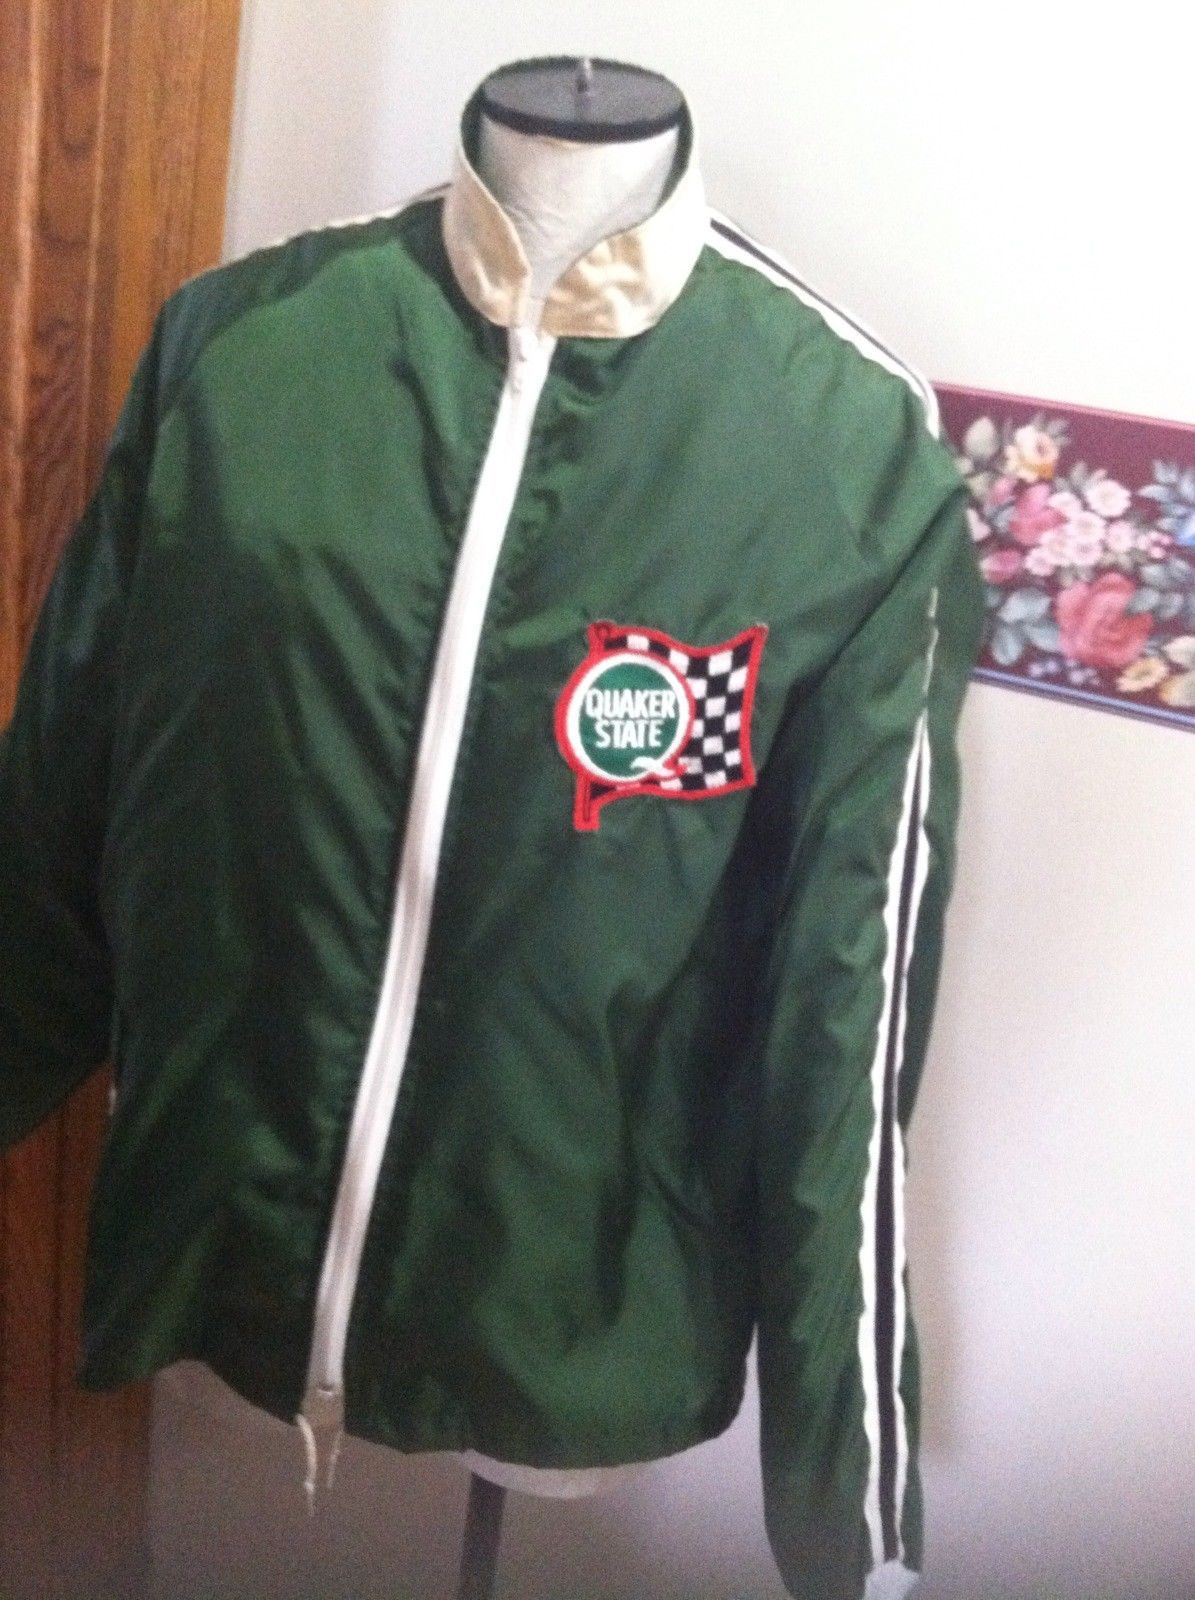 Vintage Satin Jacket Crown California Quacker Stateusa Size Large W Liner Green Ebay Satin Jackets Jackets Varsity Jacket [ 1600 x 1195 Pixel ]